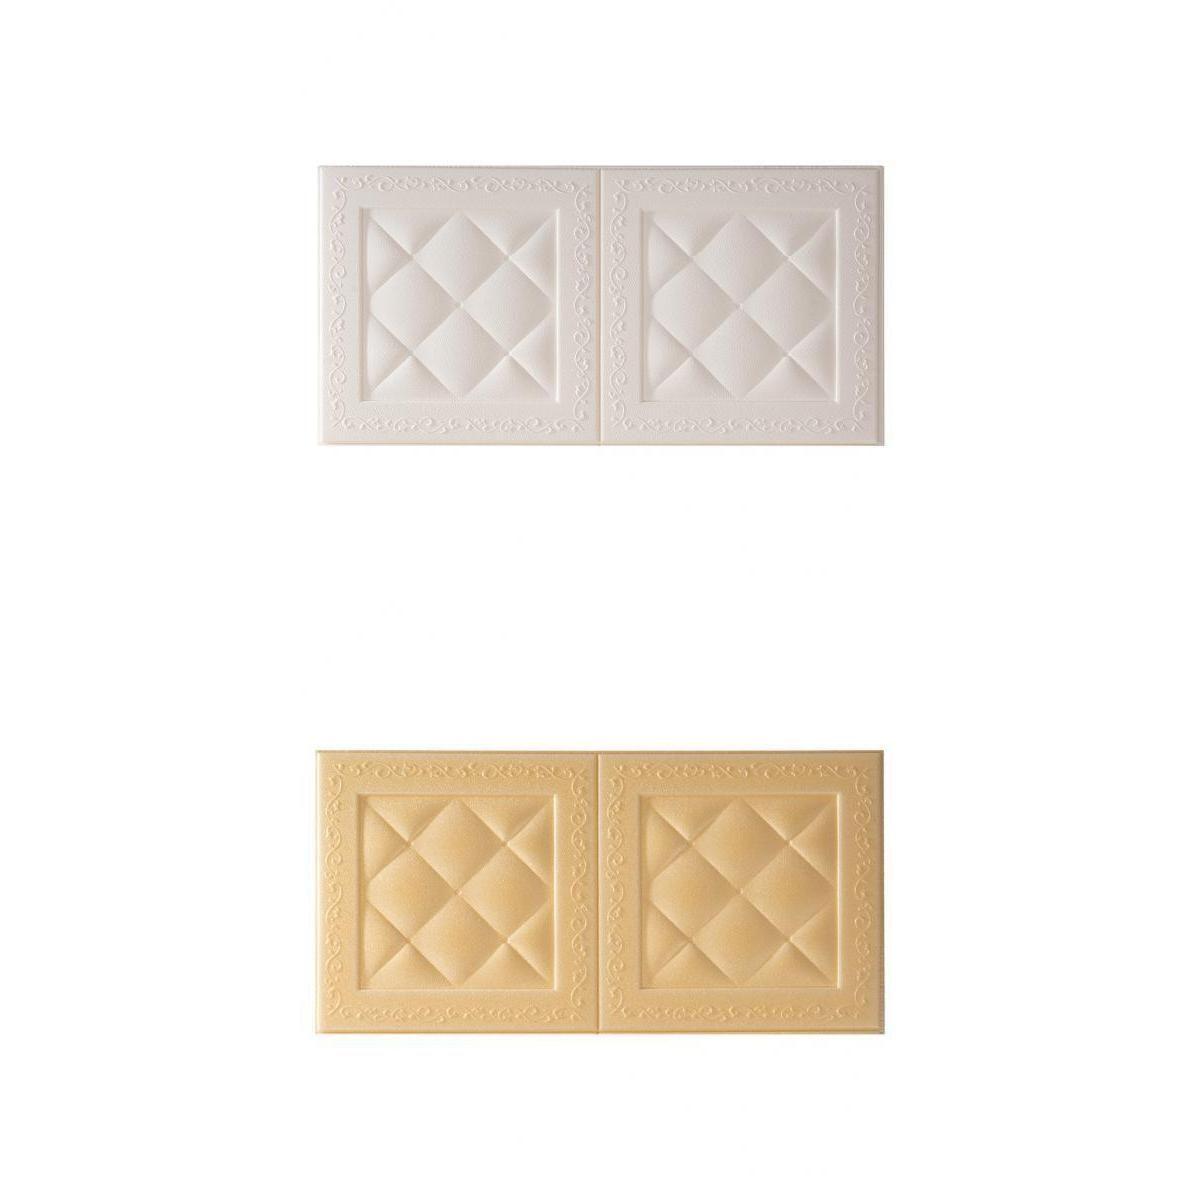 Wall Sticker 2x 3D Tile Sticker Bedrom Cucina Home Kitchen Decoration